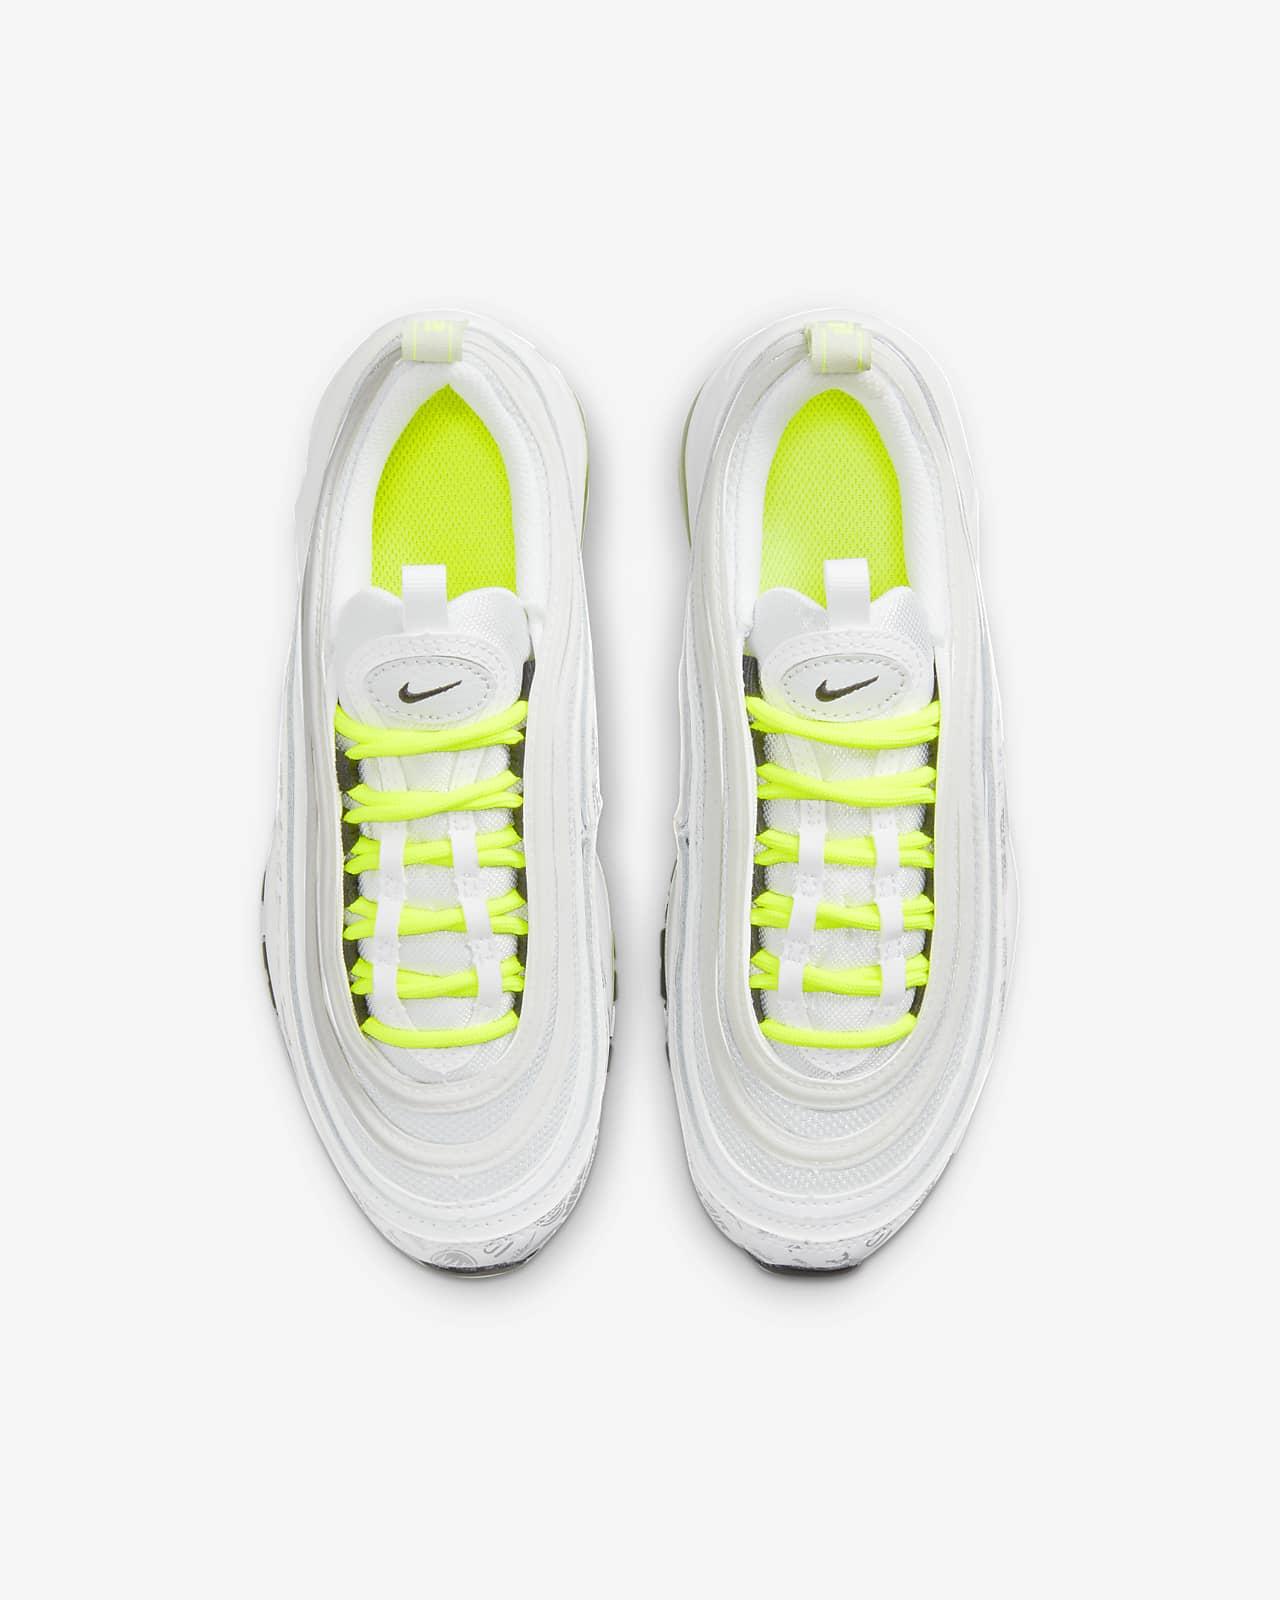 Nike Air Max 97 Older Kids' Shoes